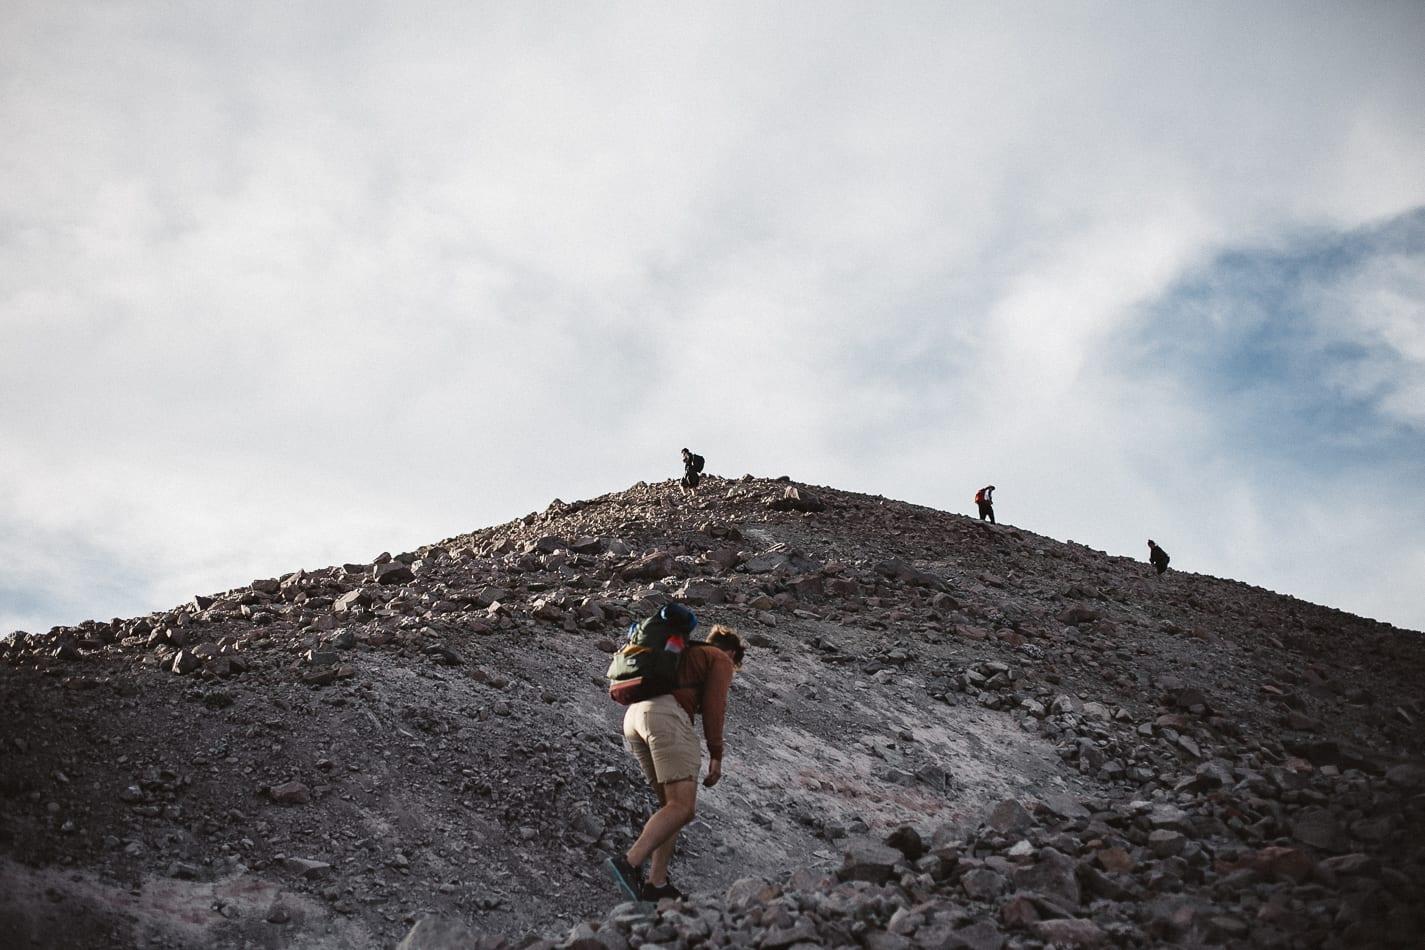 mount-lassen-california-adventure-lifestyle-photorapher-29